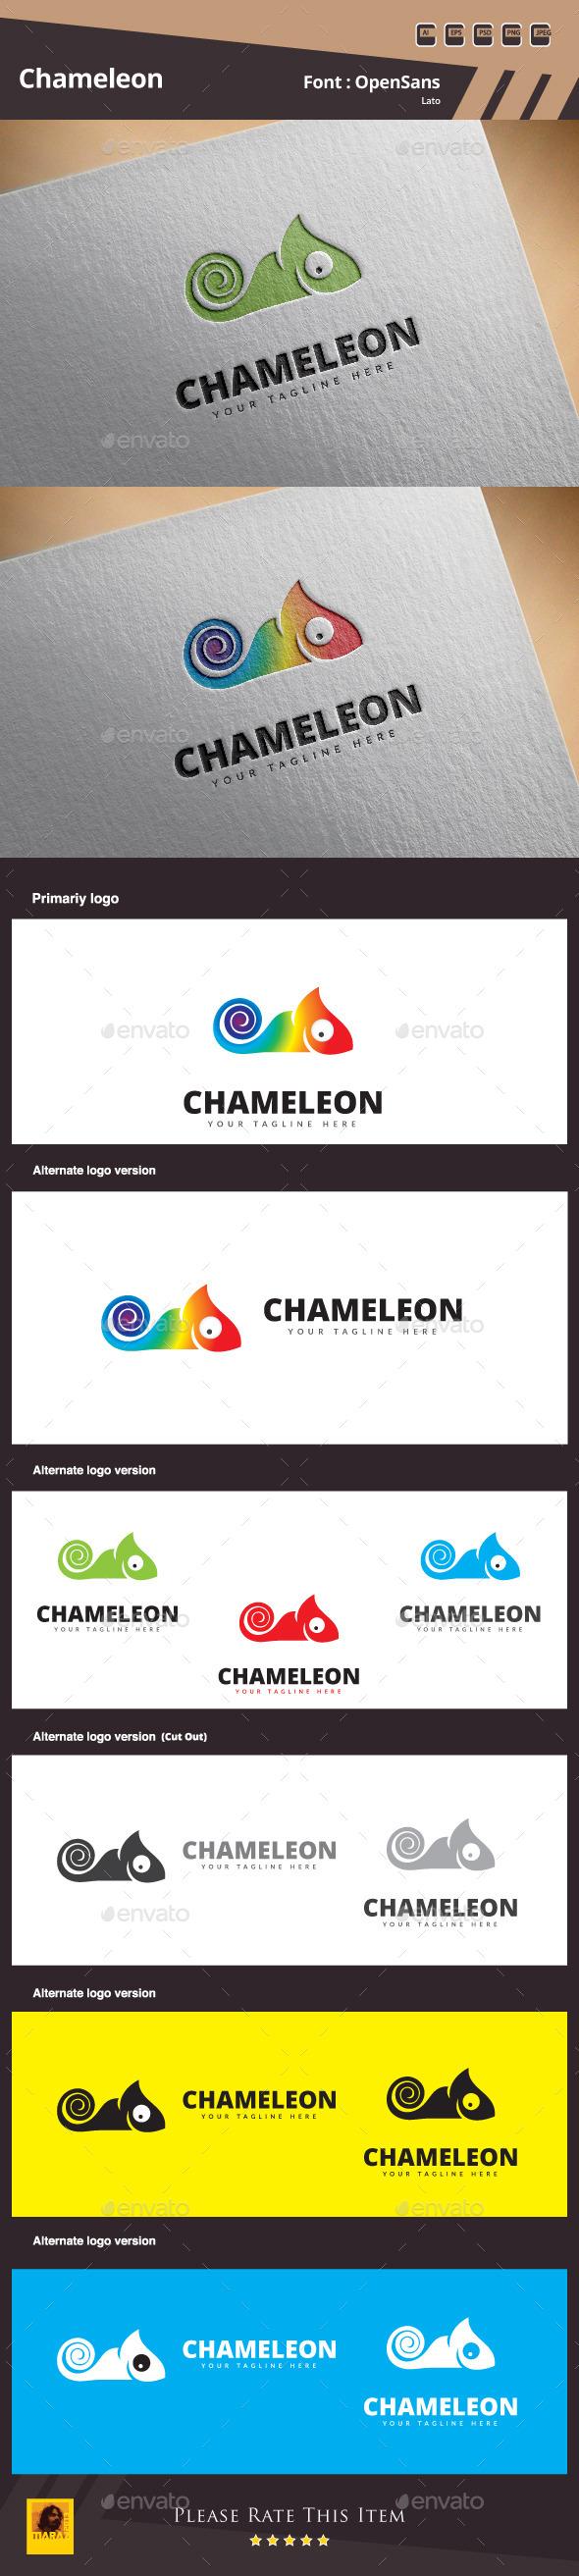 GraphicRiver Chameleon Logo Template 11146236